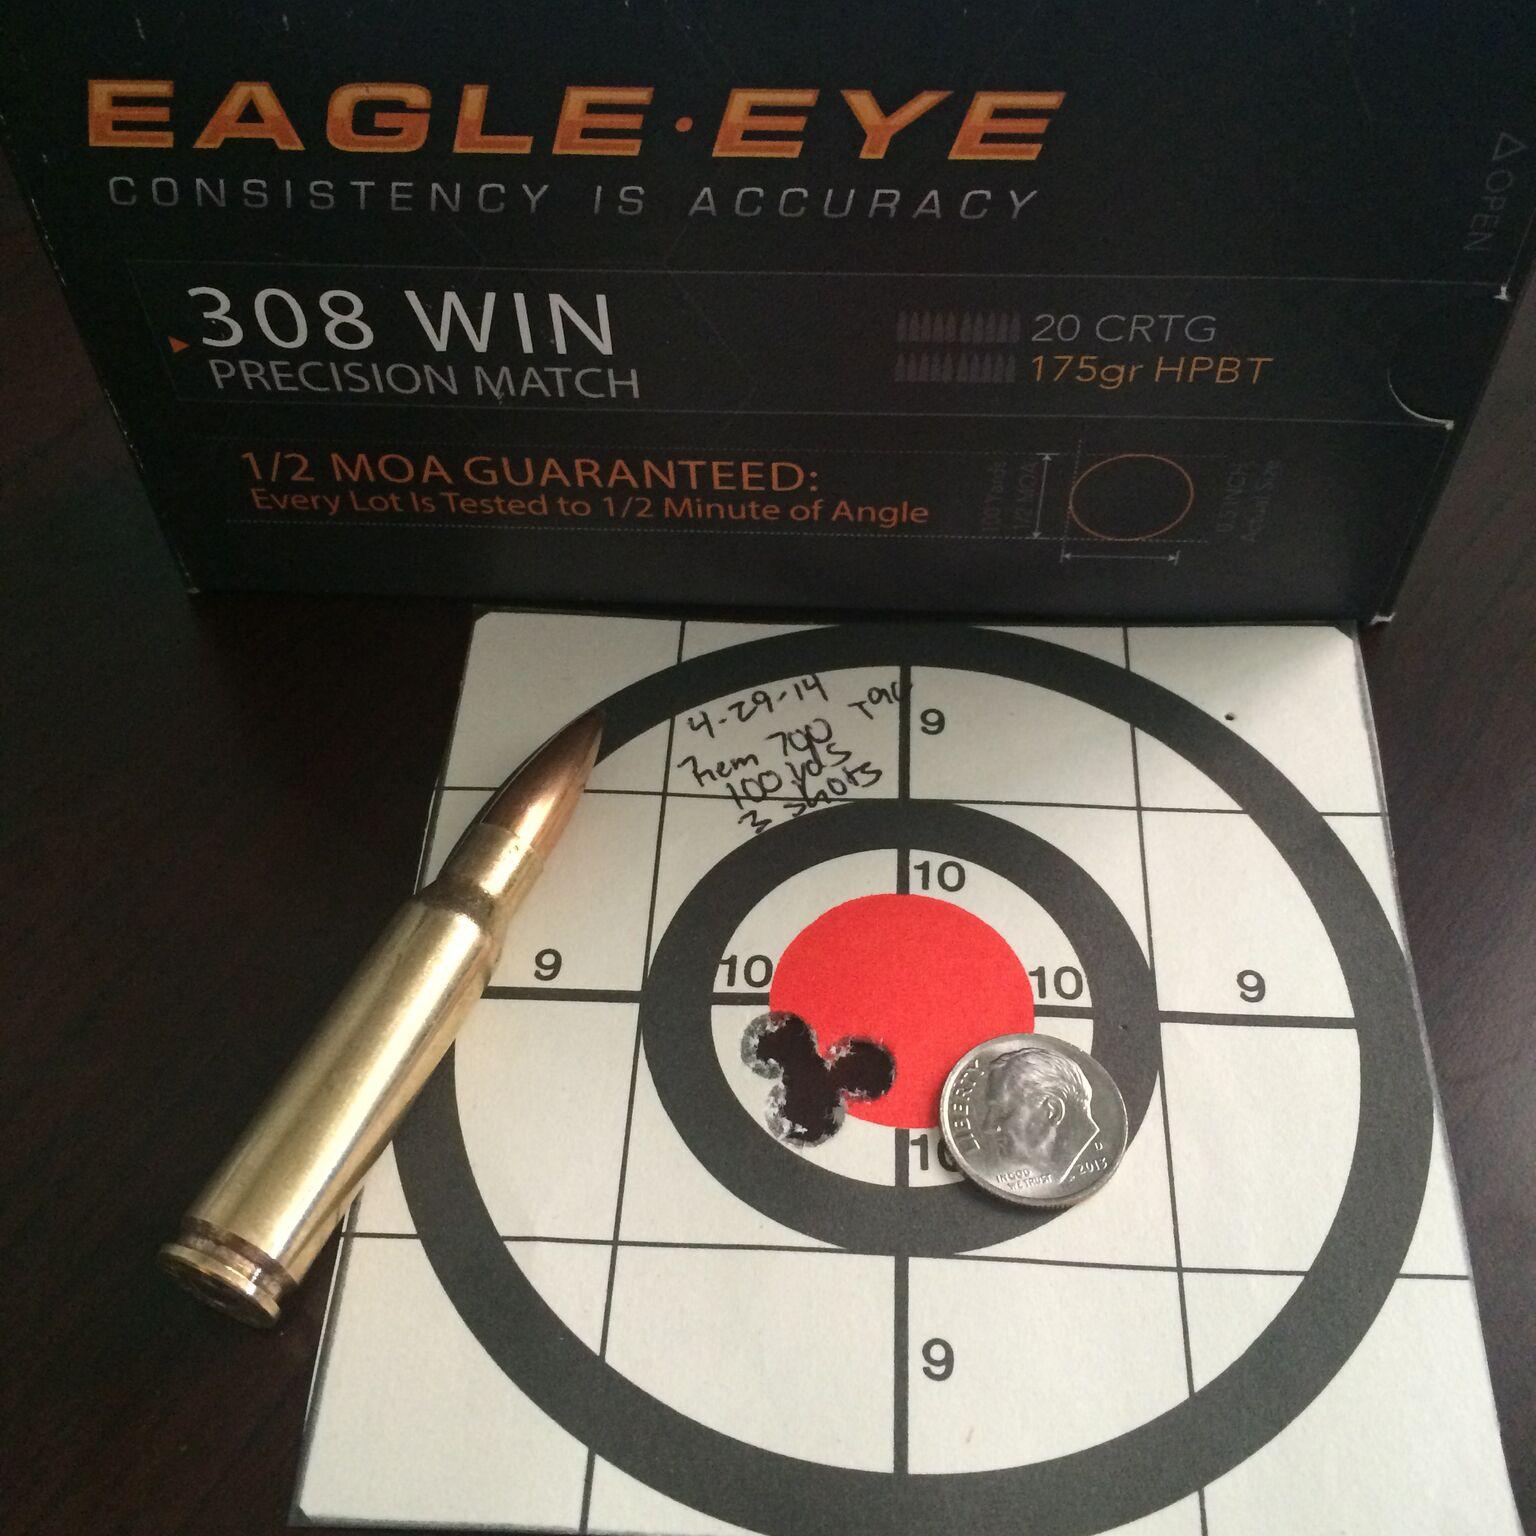 Remington 700 XCR Tactical Accuracy Test - Eagle Eye Ammo